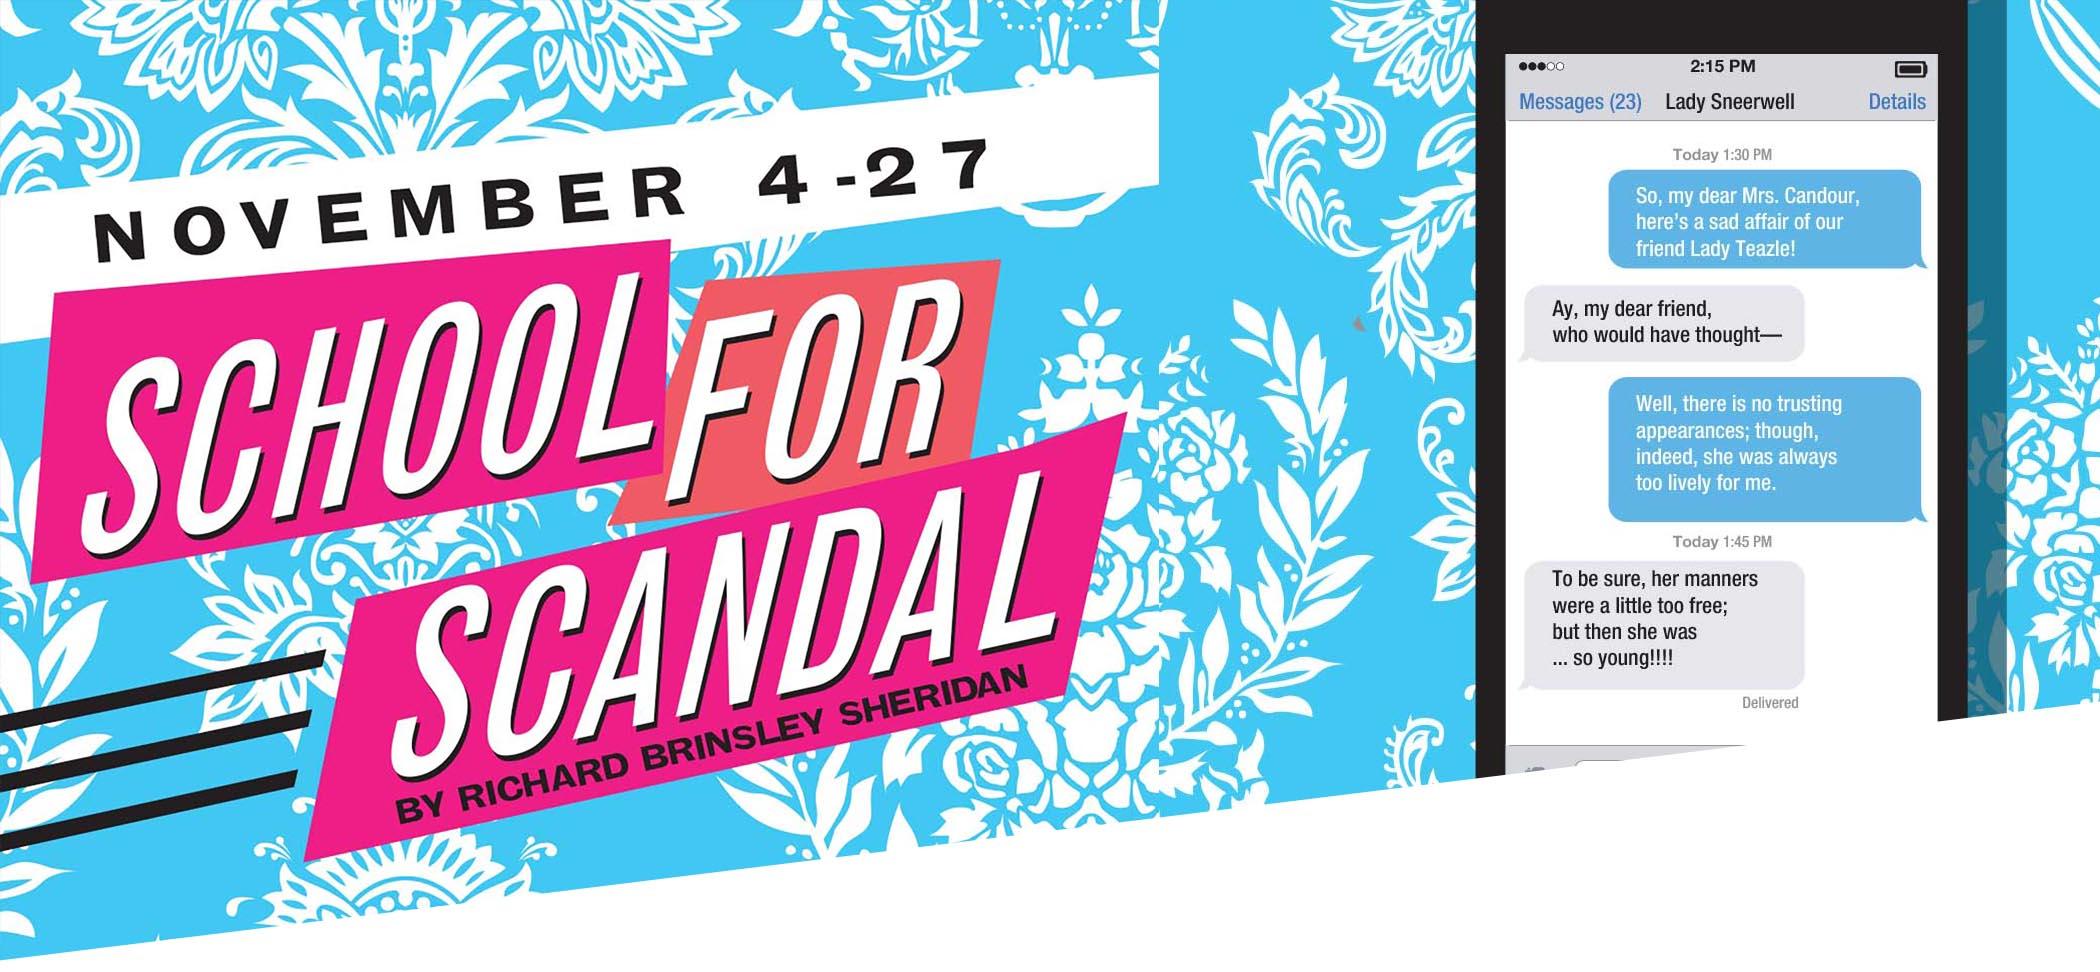 School-For-Scandal-Header-San Antonio